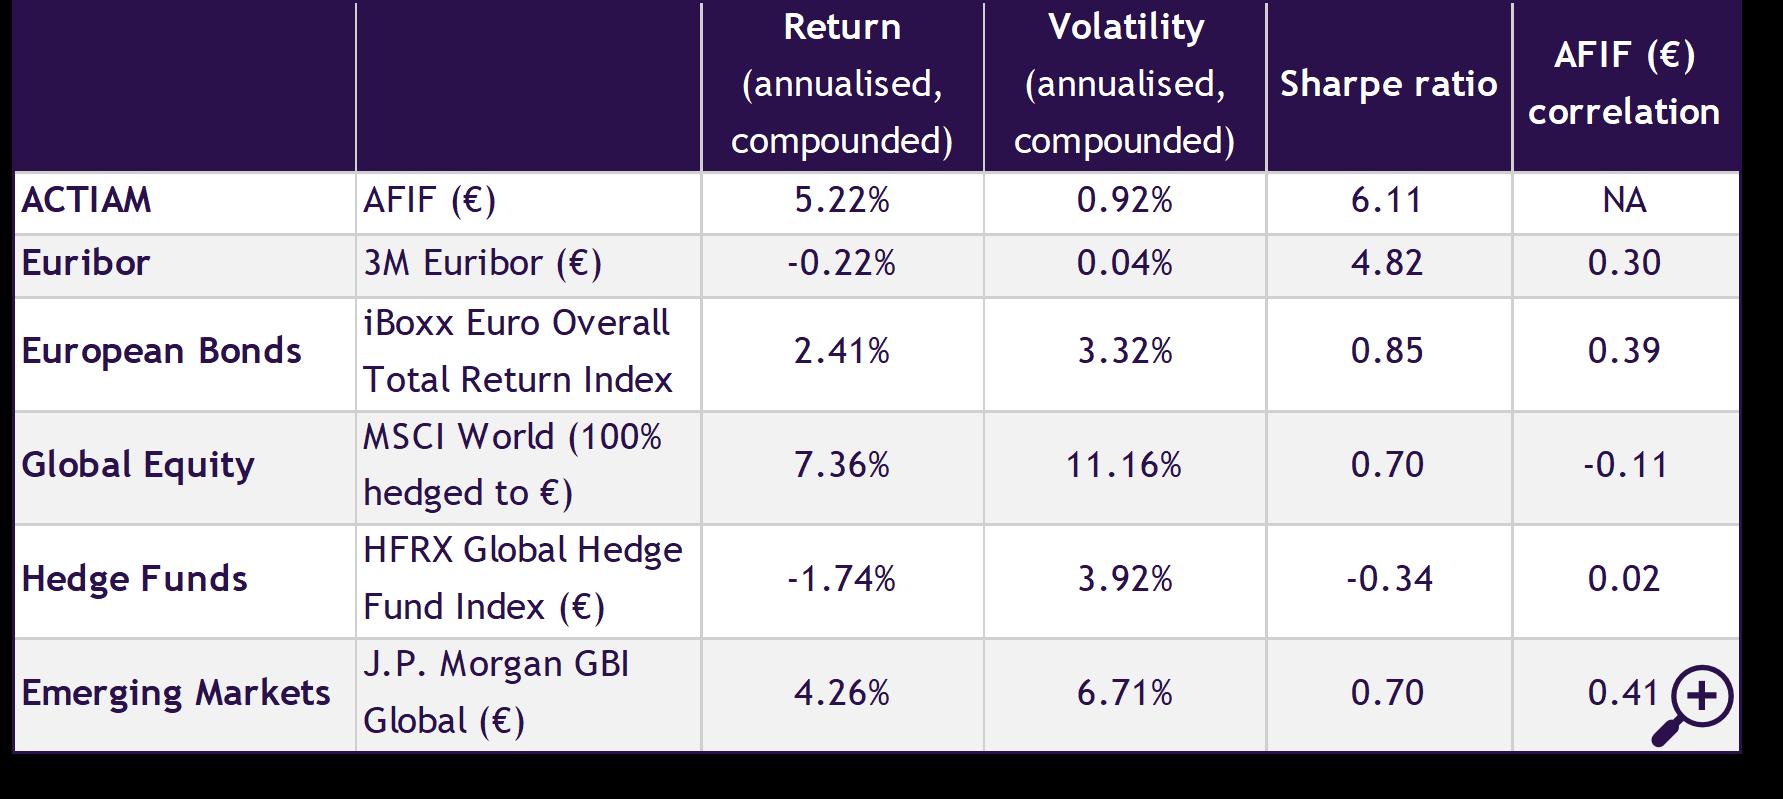 Figure 5 - Risk and return characteristics of several asset classes (gross return)